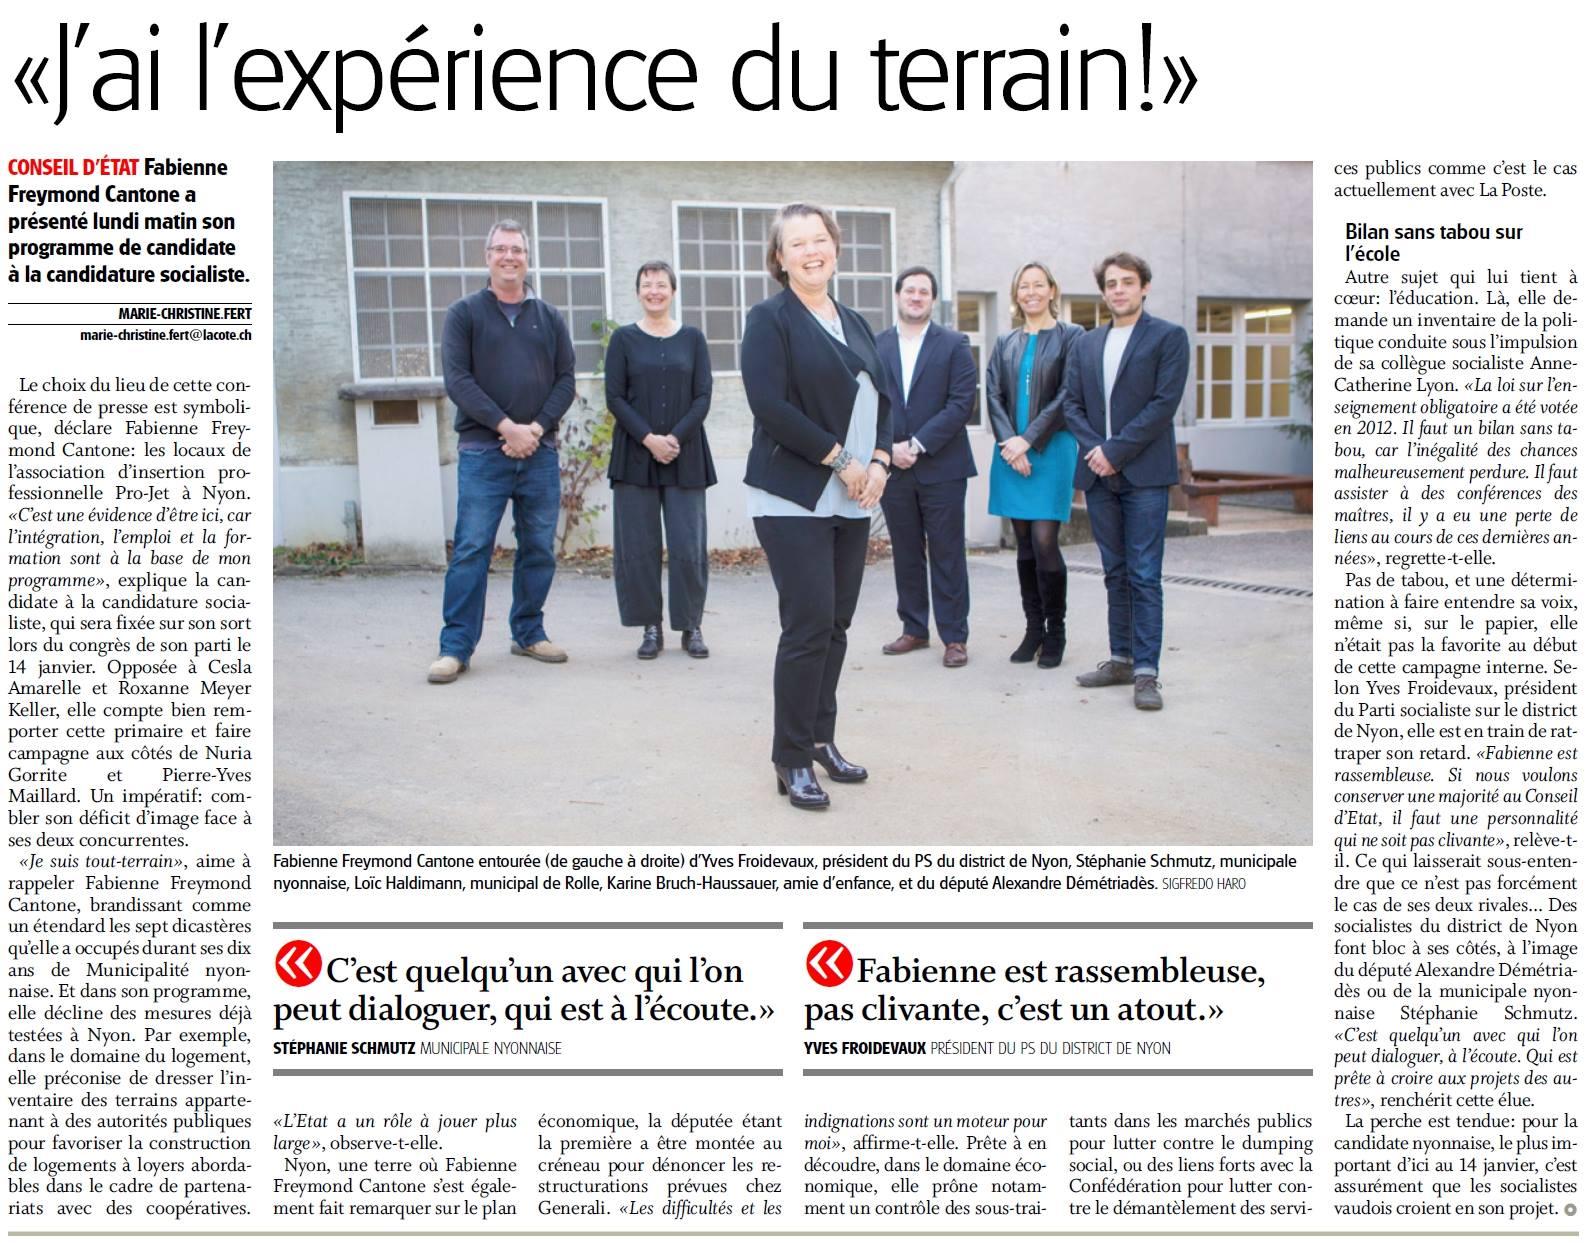 Copy of 2016-12-13 La Côte - Candidature de Fabienne Freymond Cantone